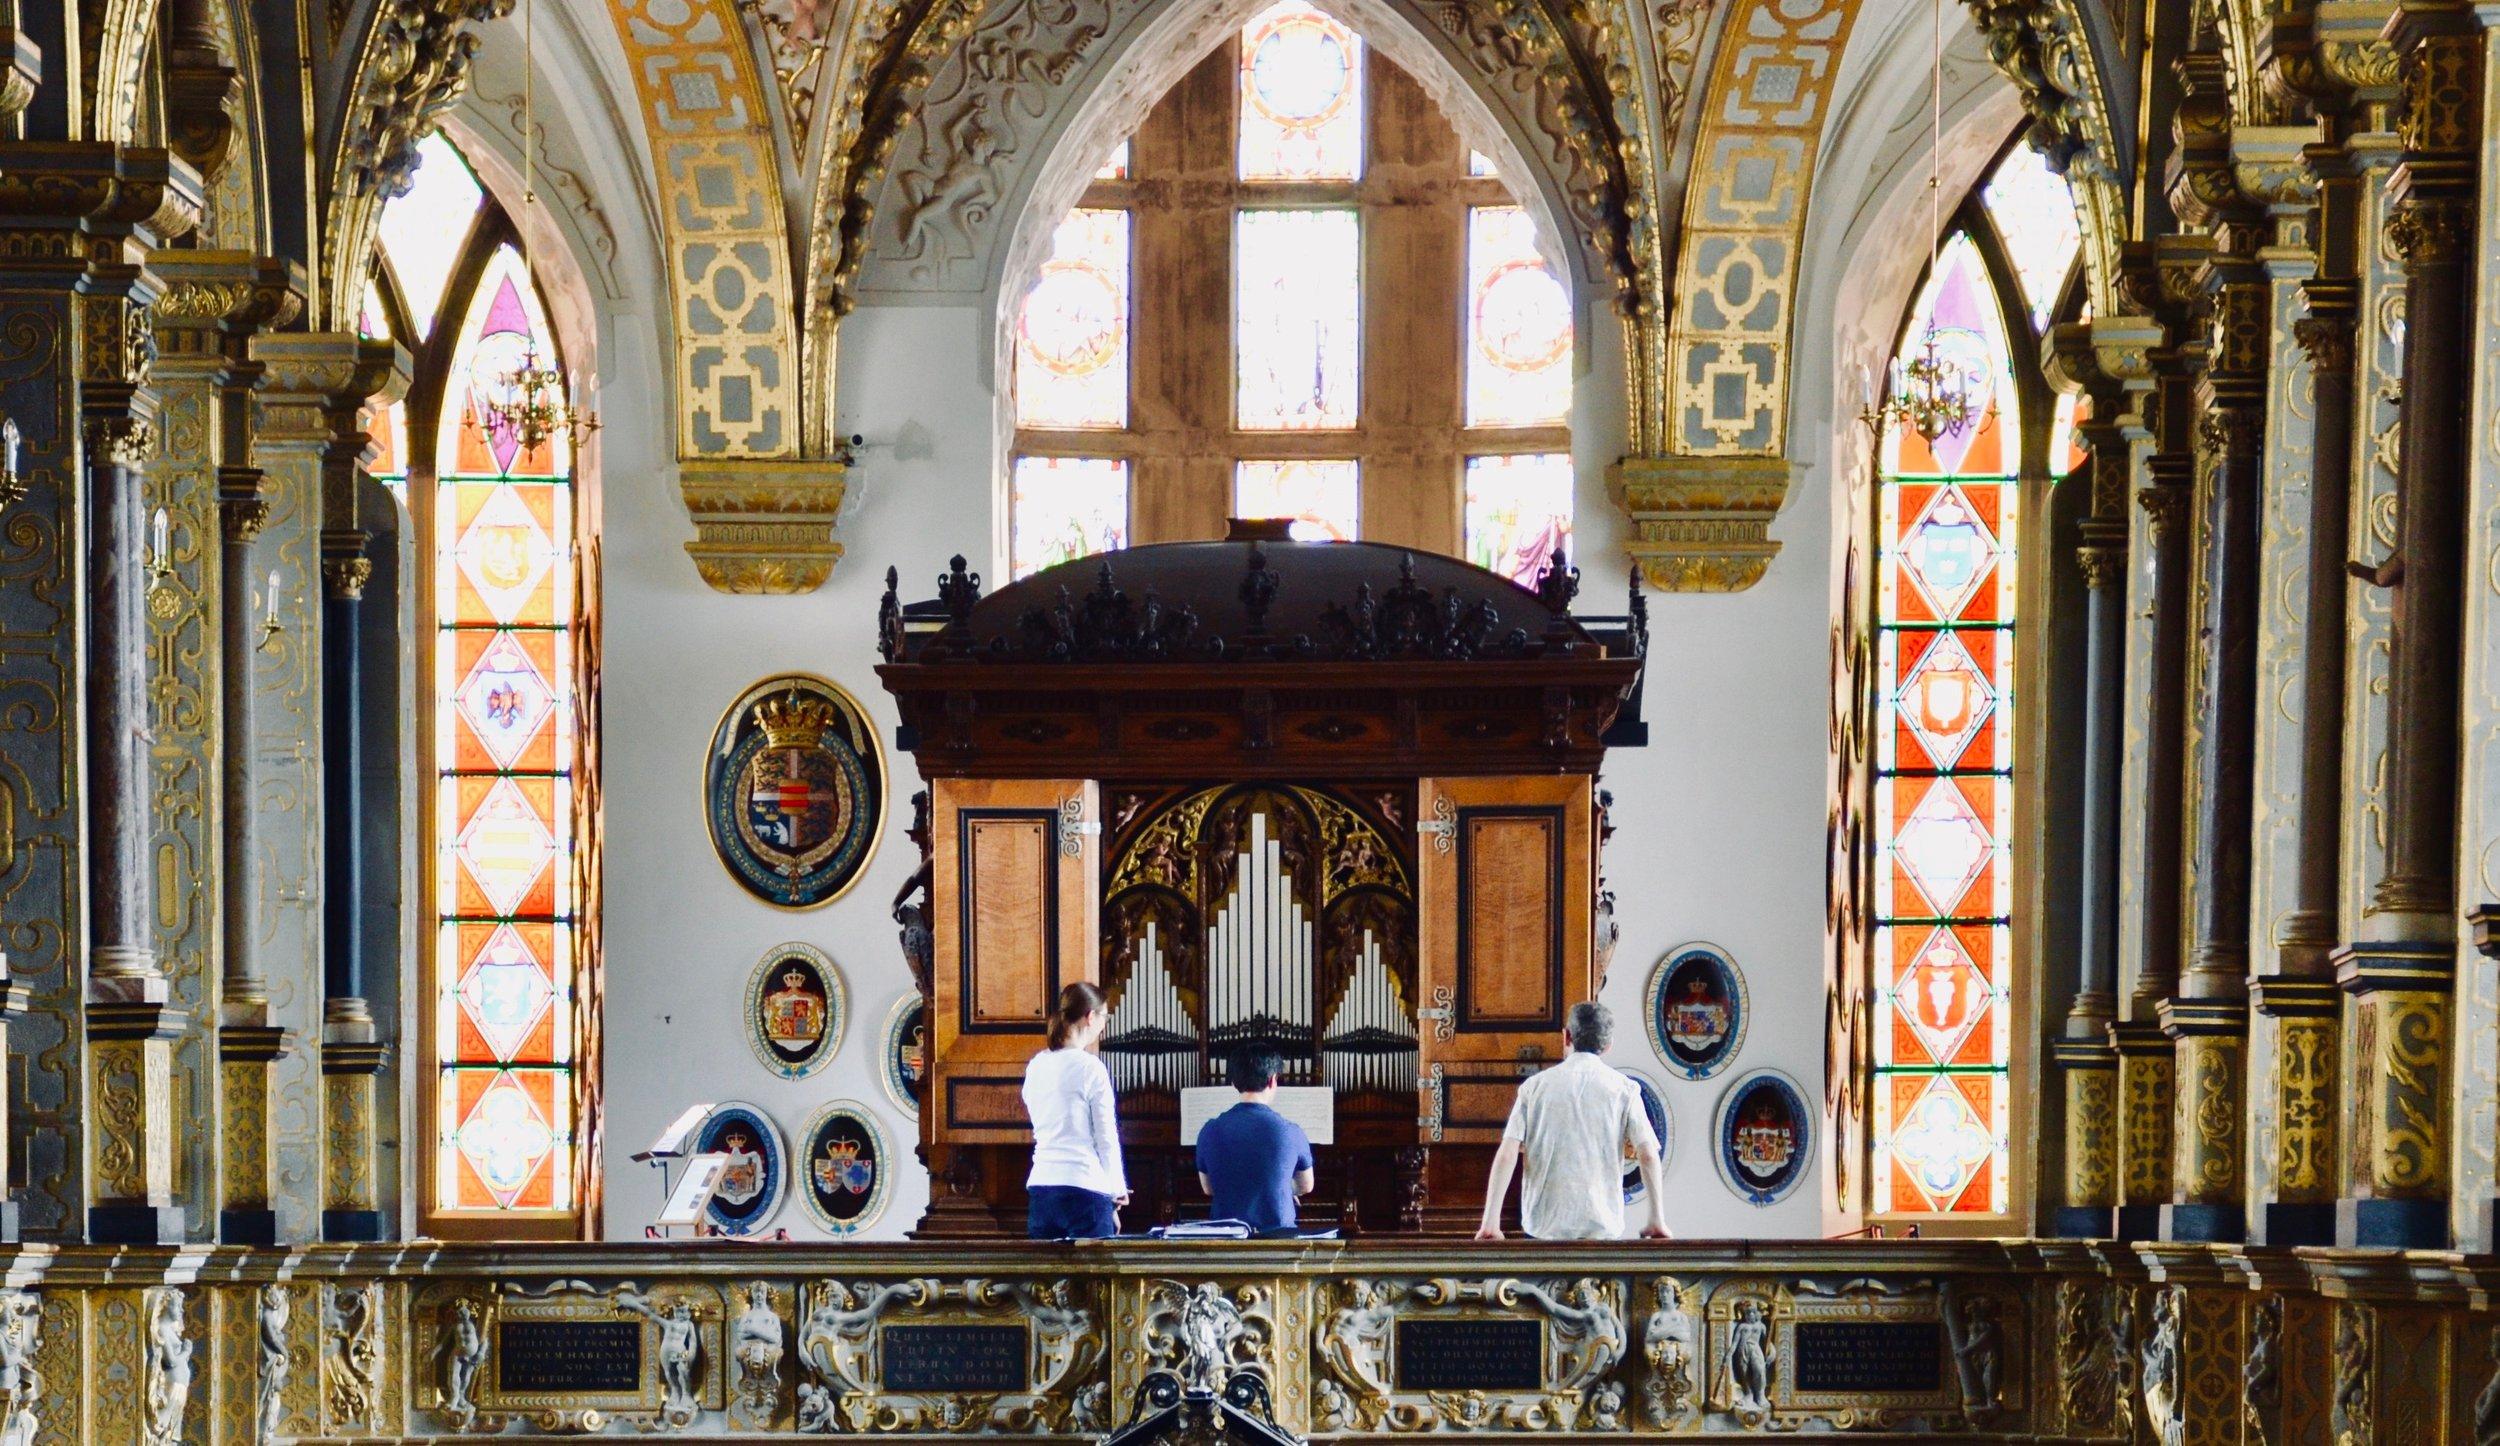 1610 Compenius organ, Frederiksborg Castle, Hillerød, Denmark.